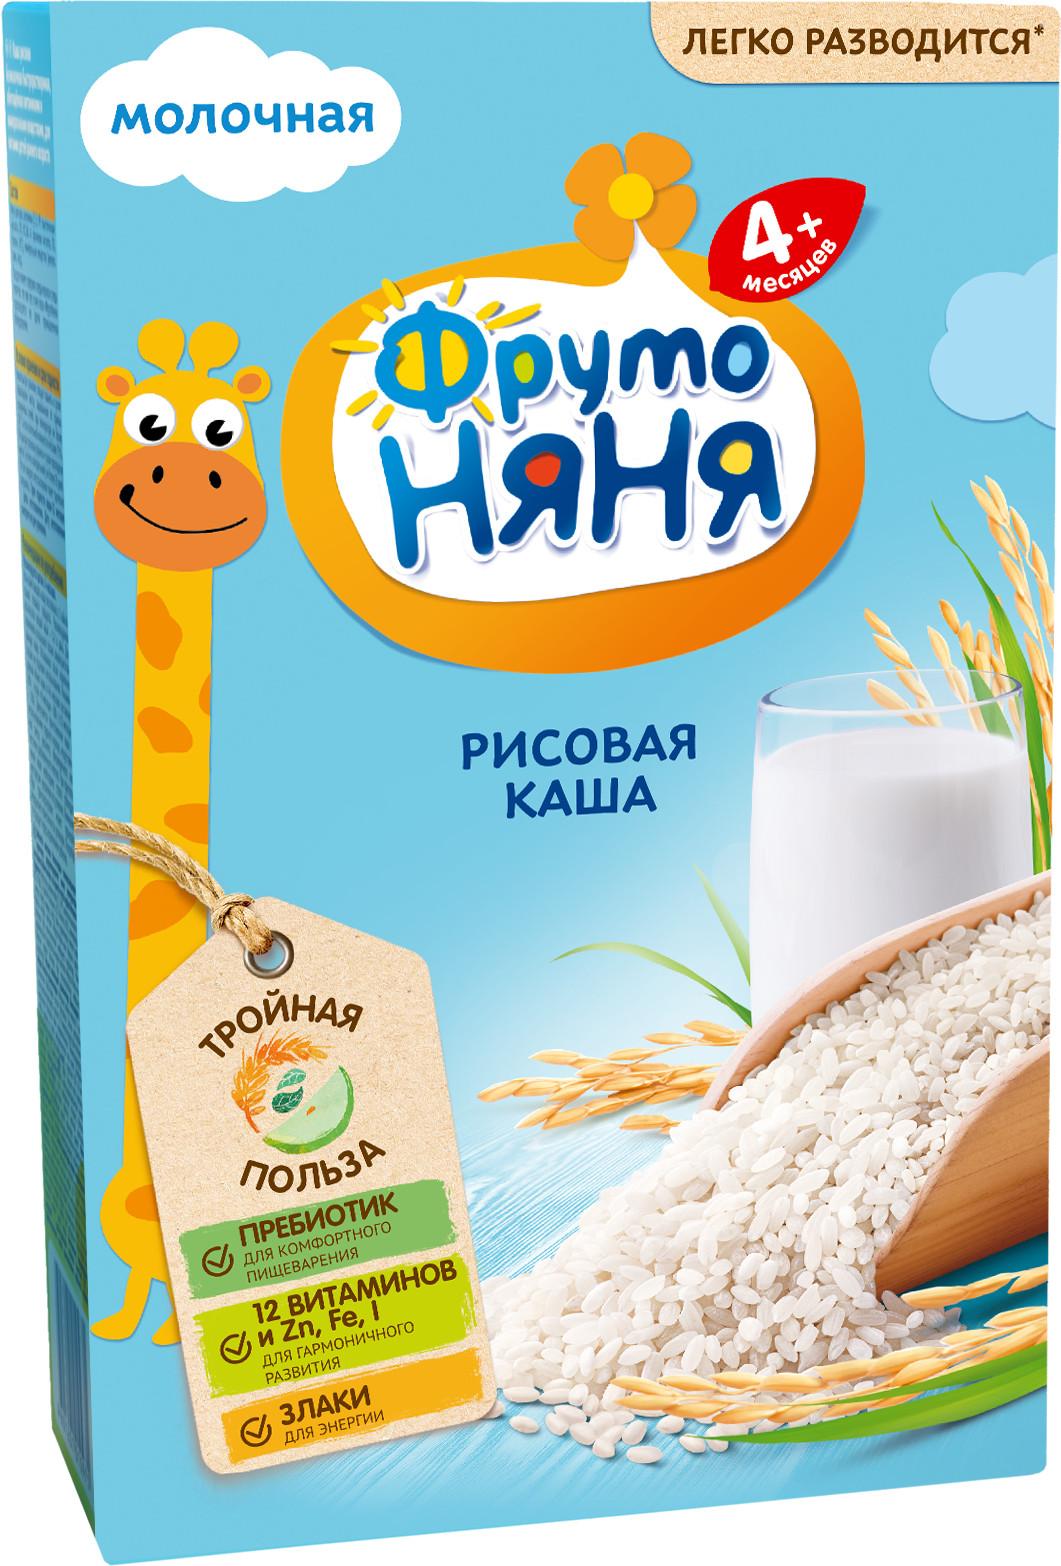 Каши Фрутоняня ФрутоНяня молочная рисовая с 4 мес. 200 г каша готовая молочная фрутоняня рисовая с 6 мес 200 мл